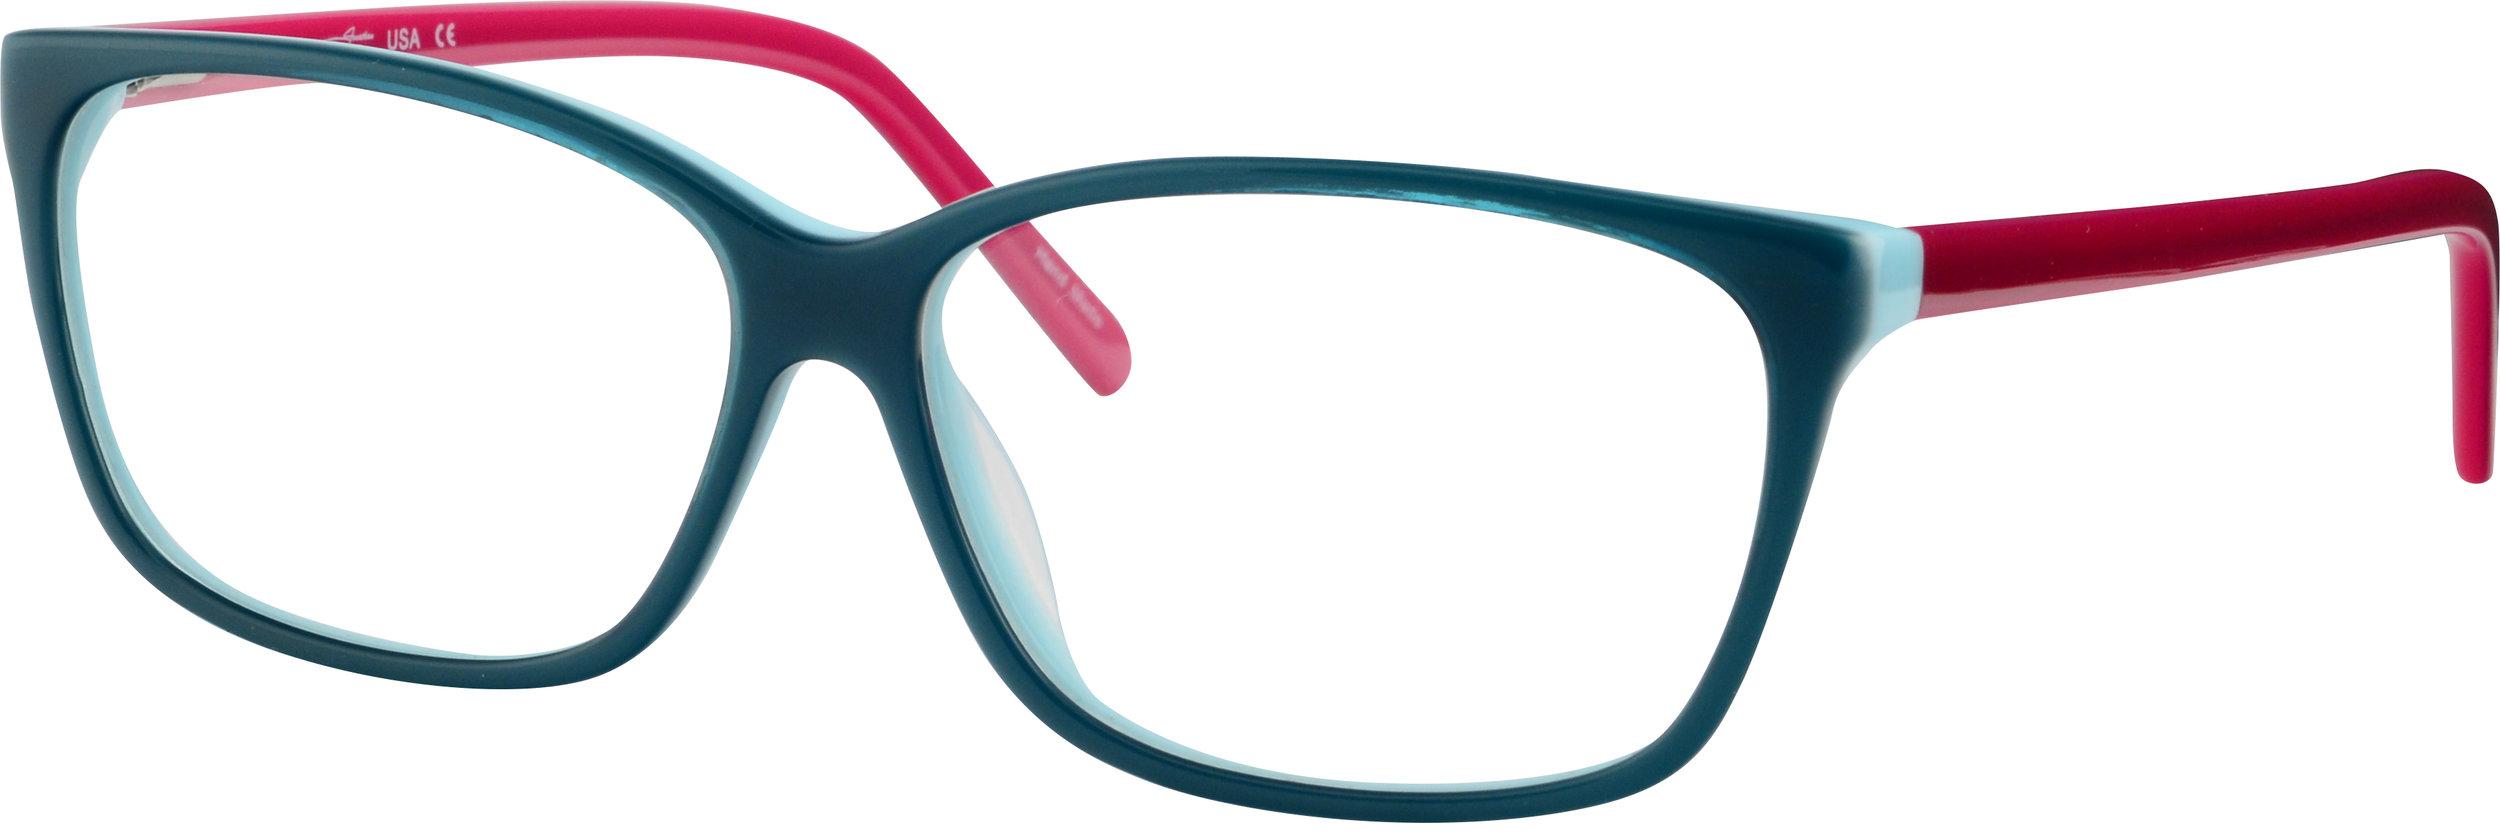 eyewear01.jpeg.jpg